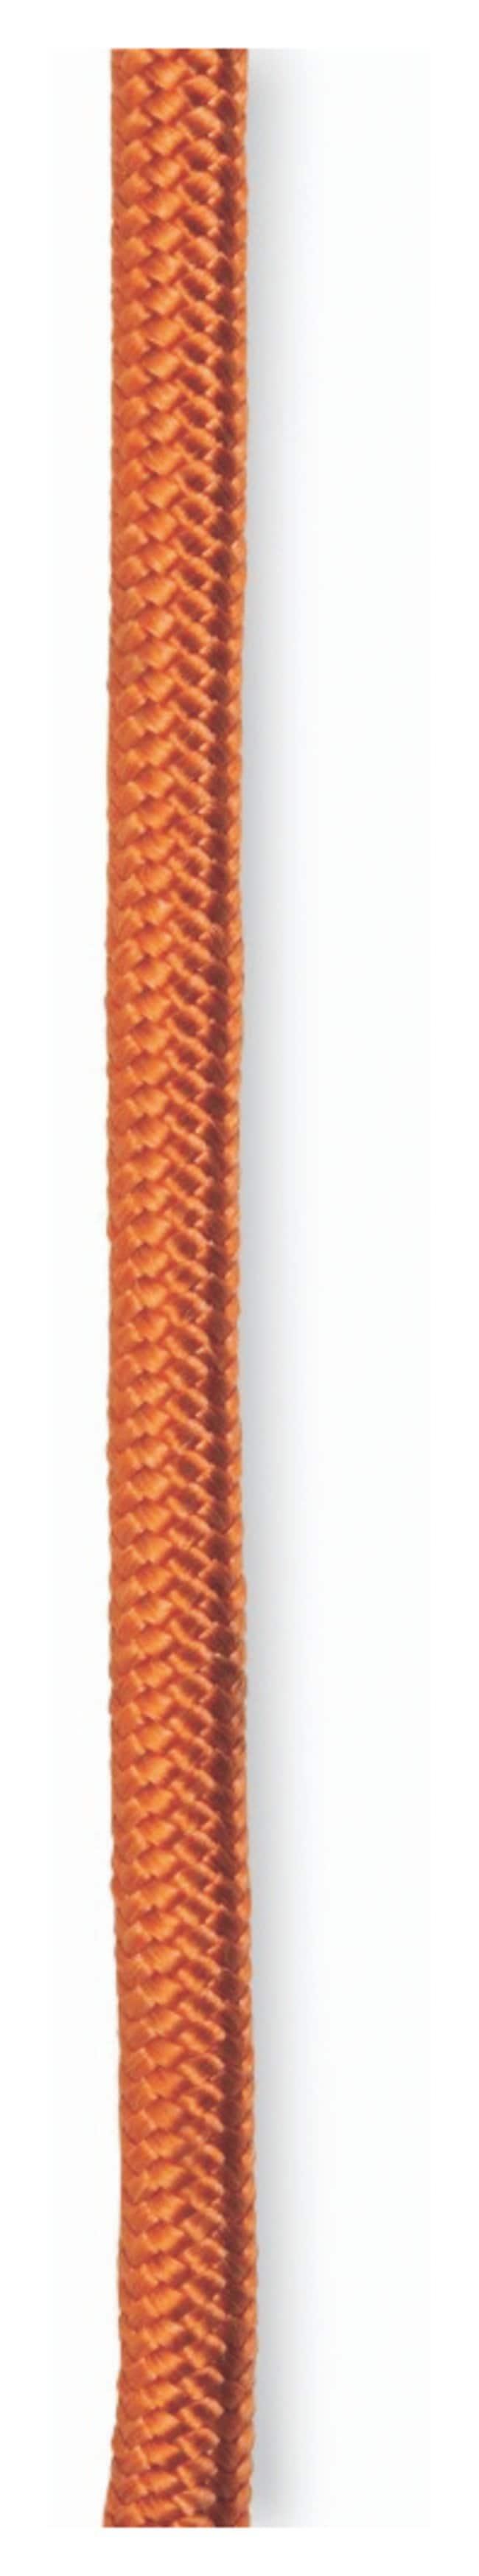 CMC Rescue Prusik Cord and Load Release Hitch Cord Orange:Gloves, Glasses